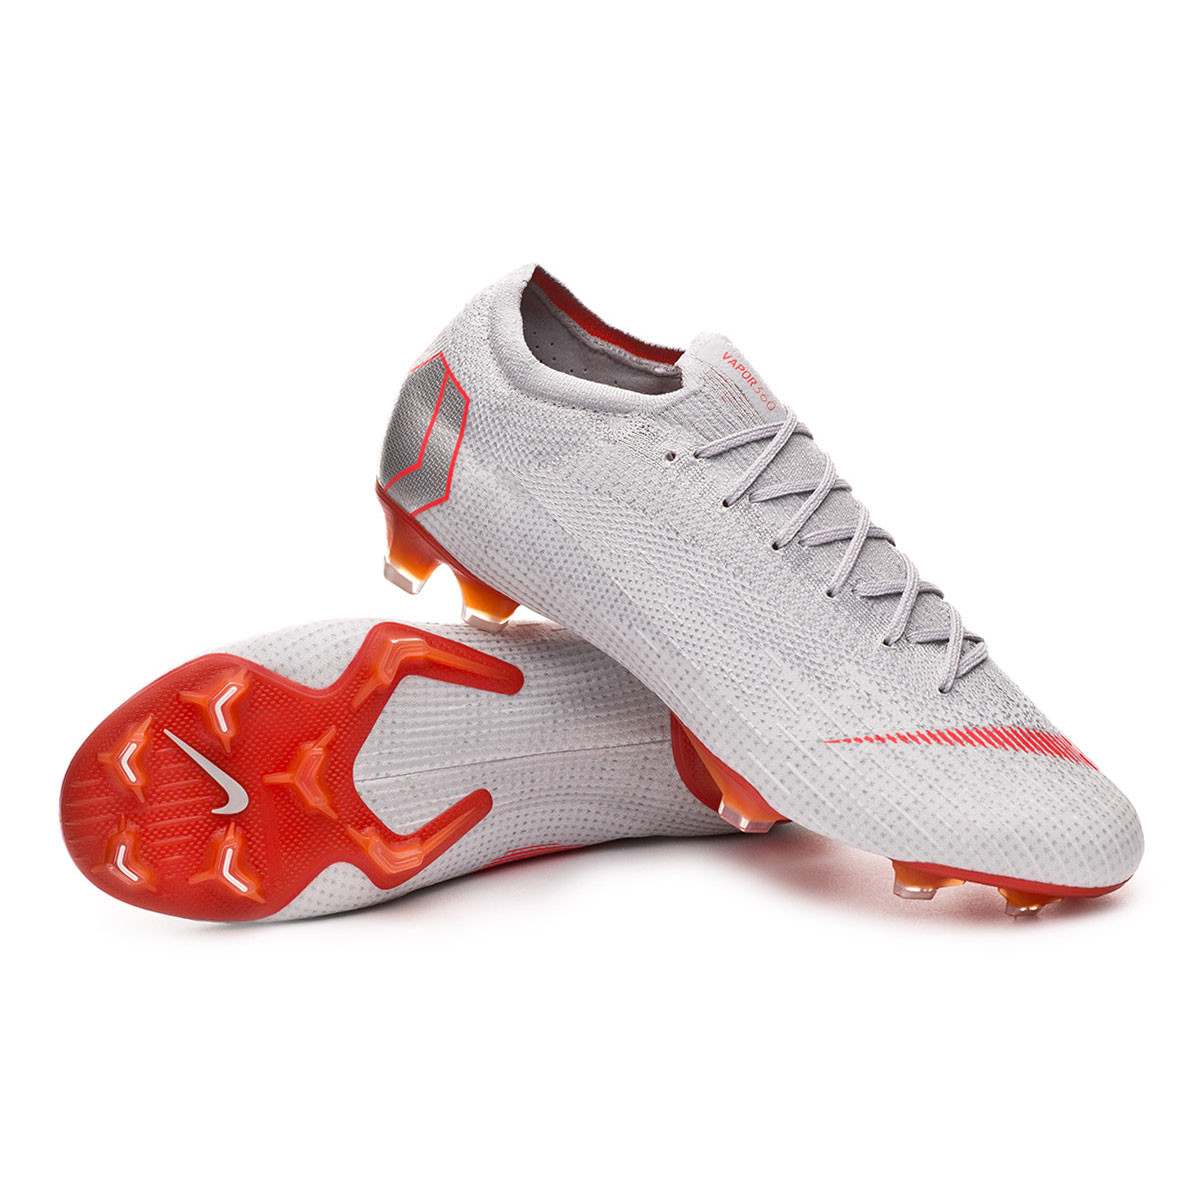 sports shoes 3fa7f fdaf4 CATEGORY. Football boots · Nike football boots · Nike Mercurial · Nike  Mercurial Vapor Elite · Football boots